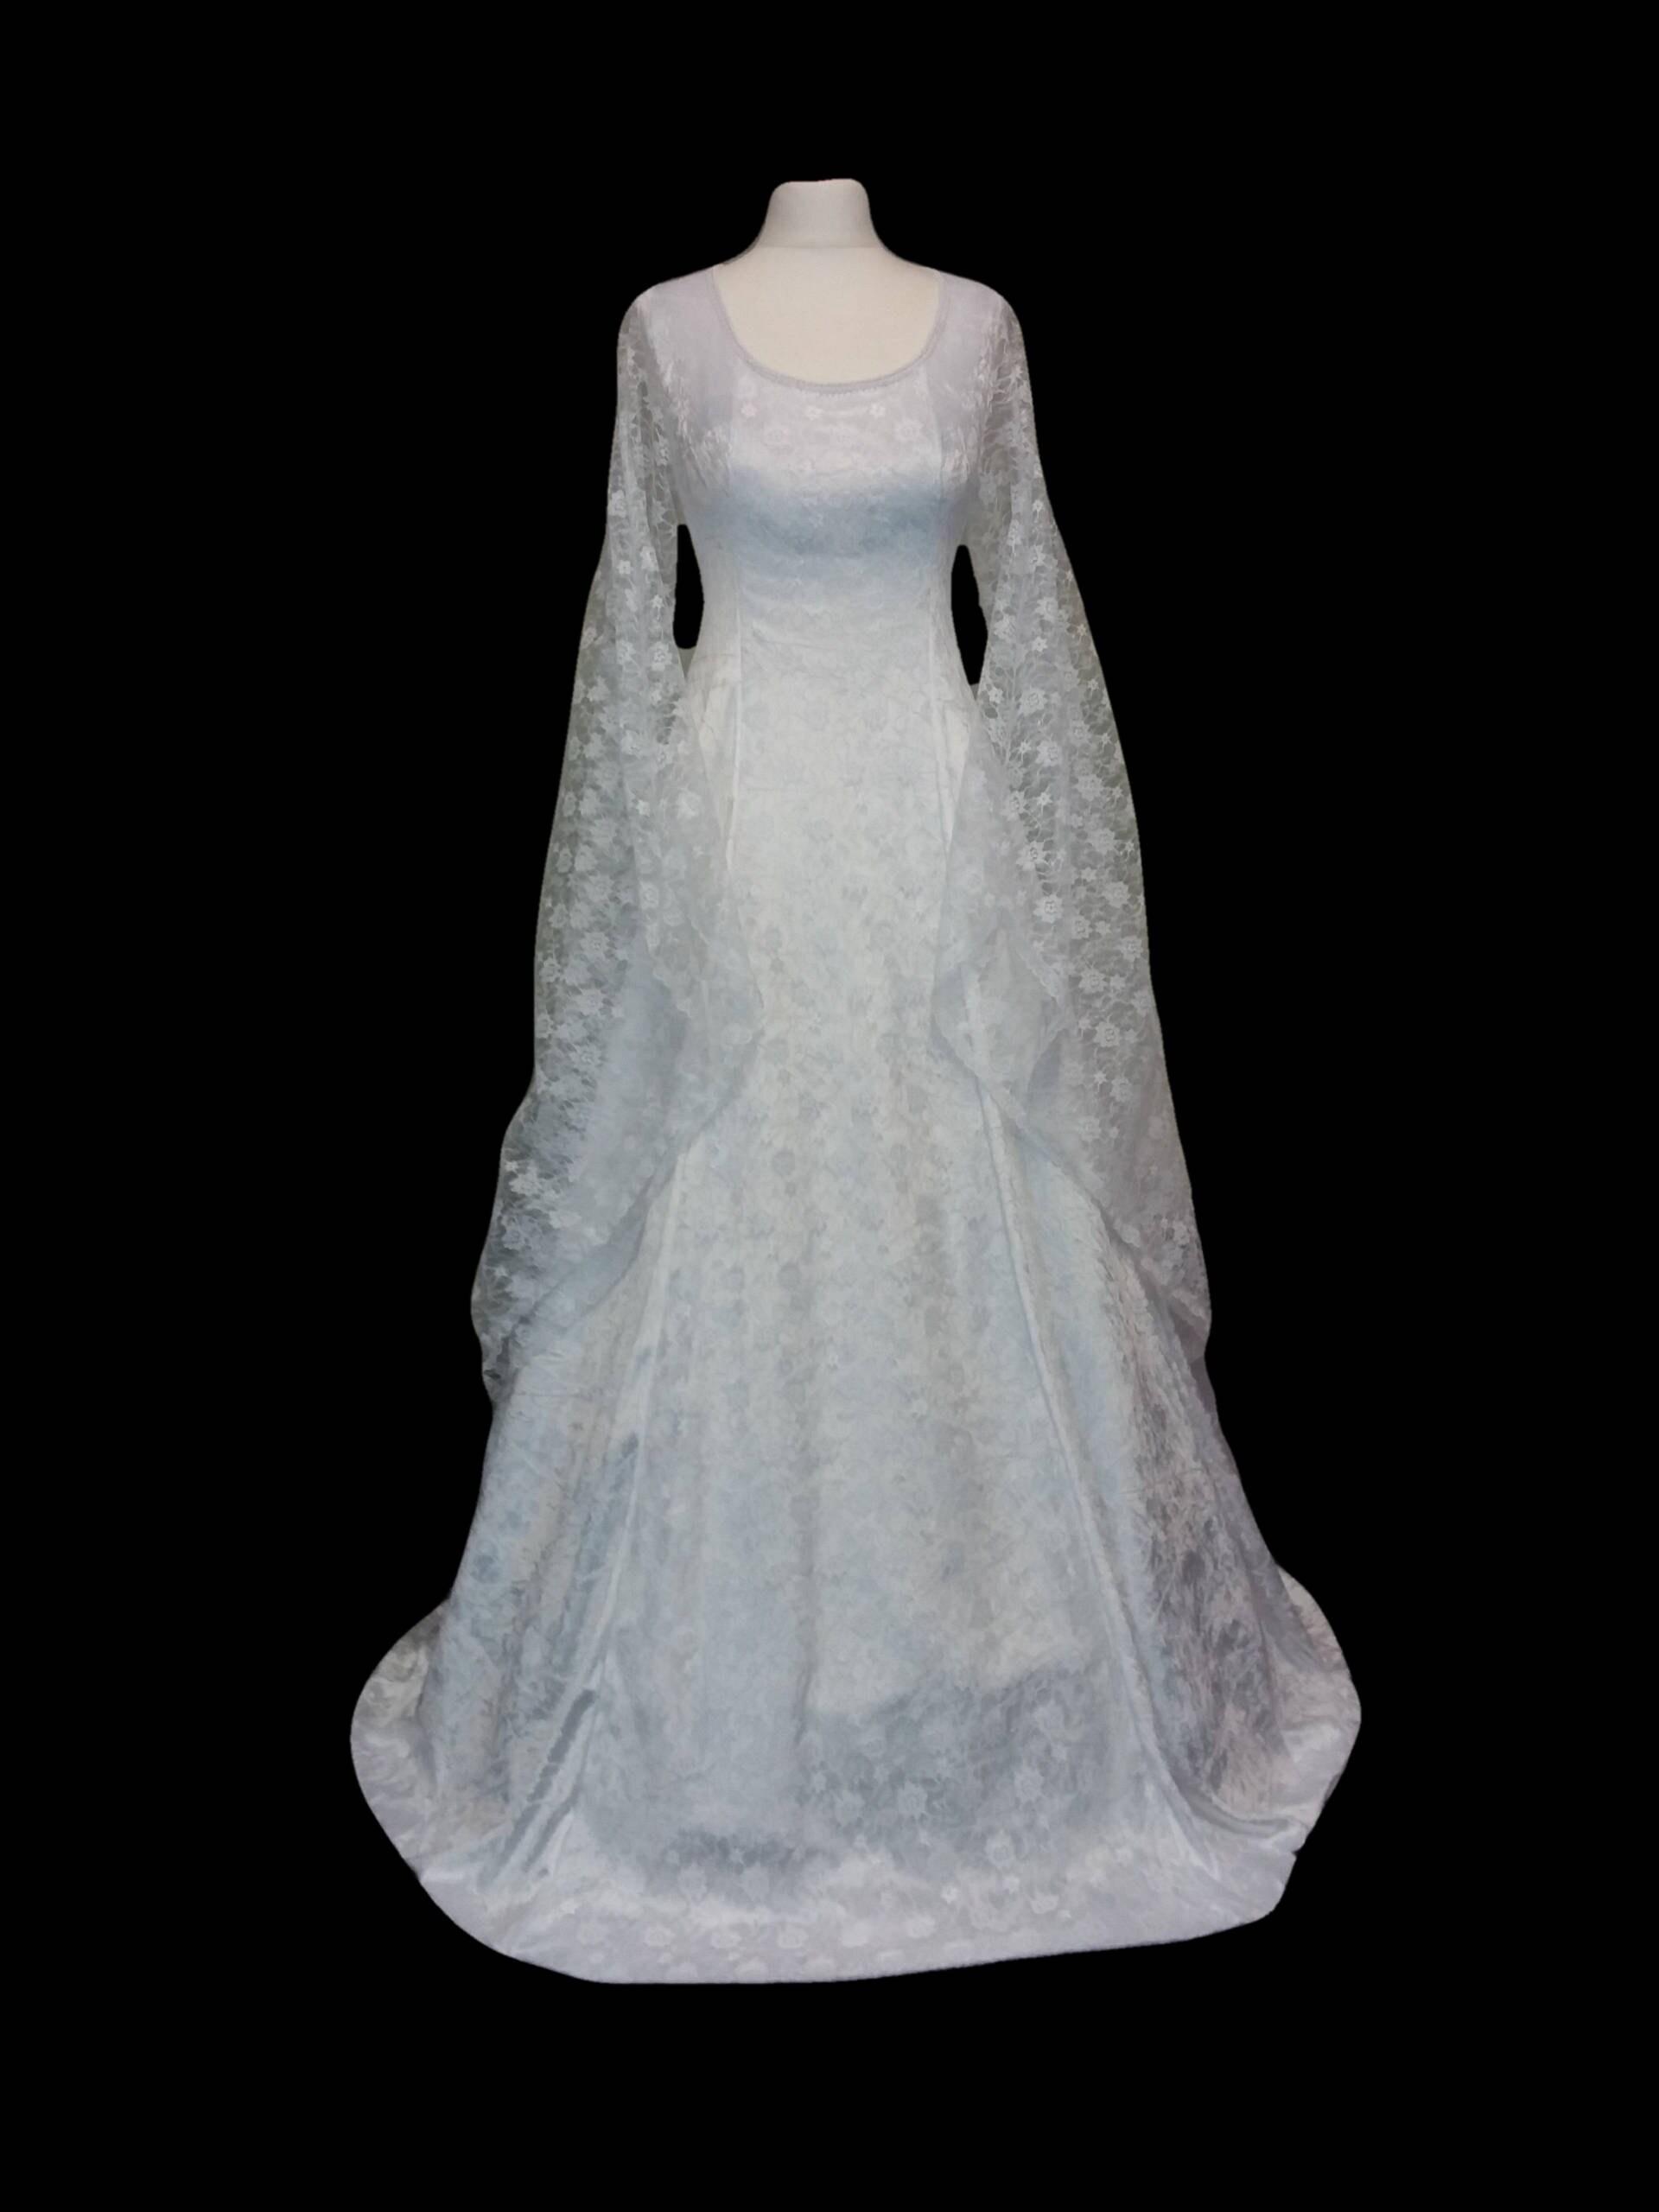 Renaissance dress wedding dress medieval wedding gown Princess gown white lace dress